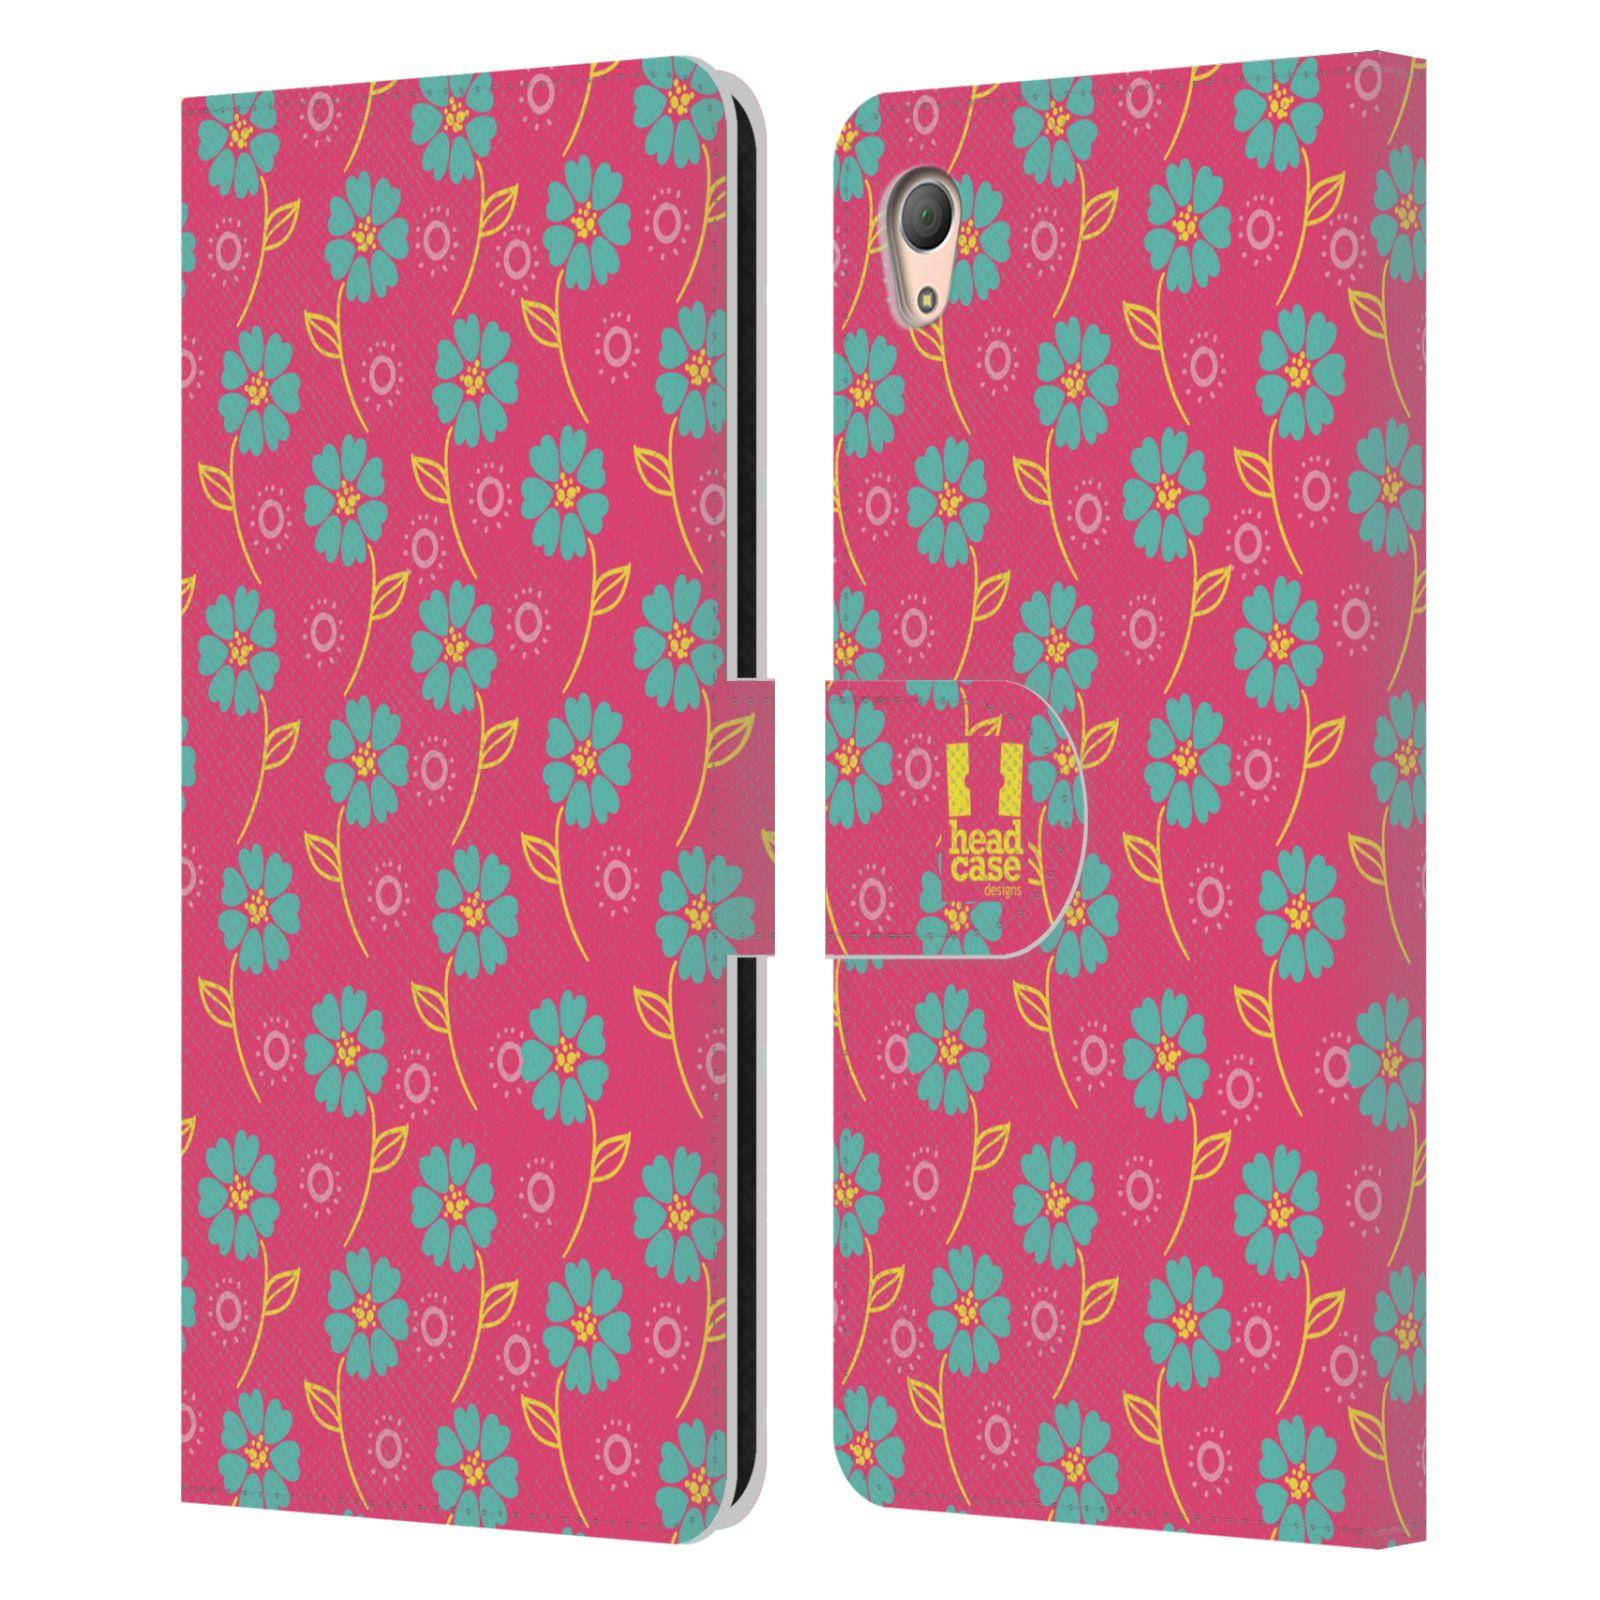 HEAD CASE Flipové pouzdro pro mobil SONY XPERIA Z3+ (PLUS) Slovanský vzor růžová a modrá květiny